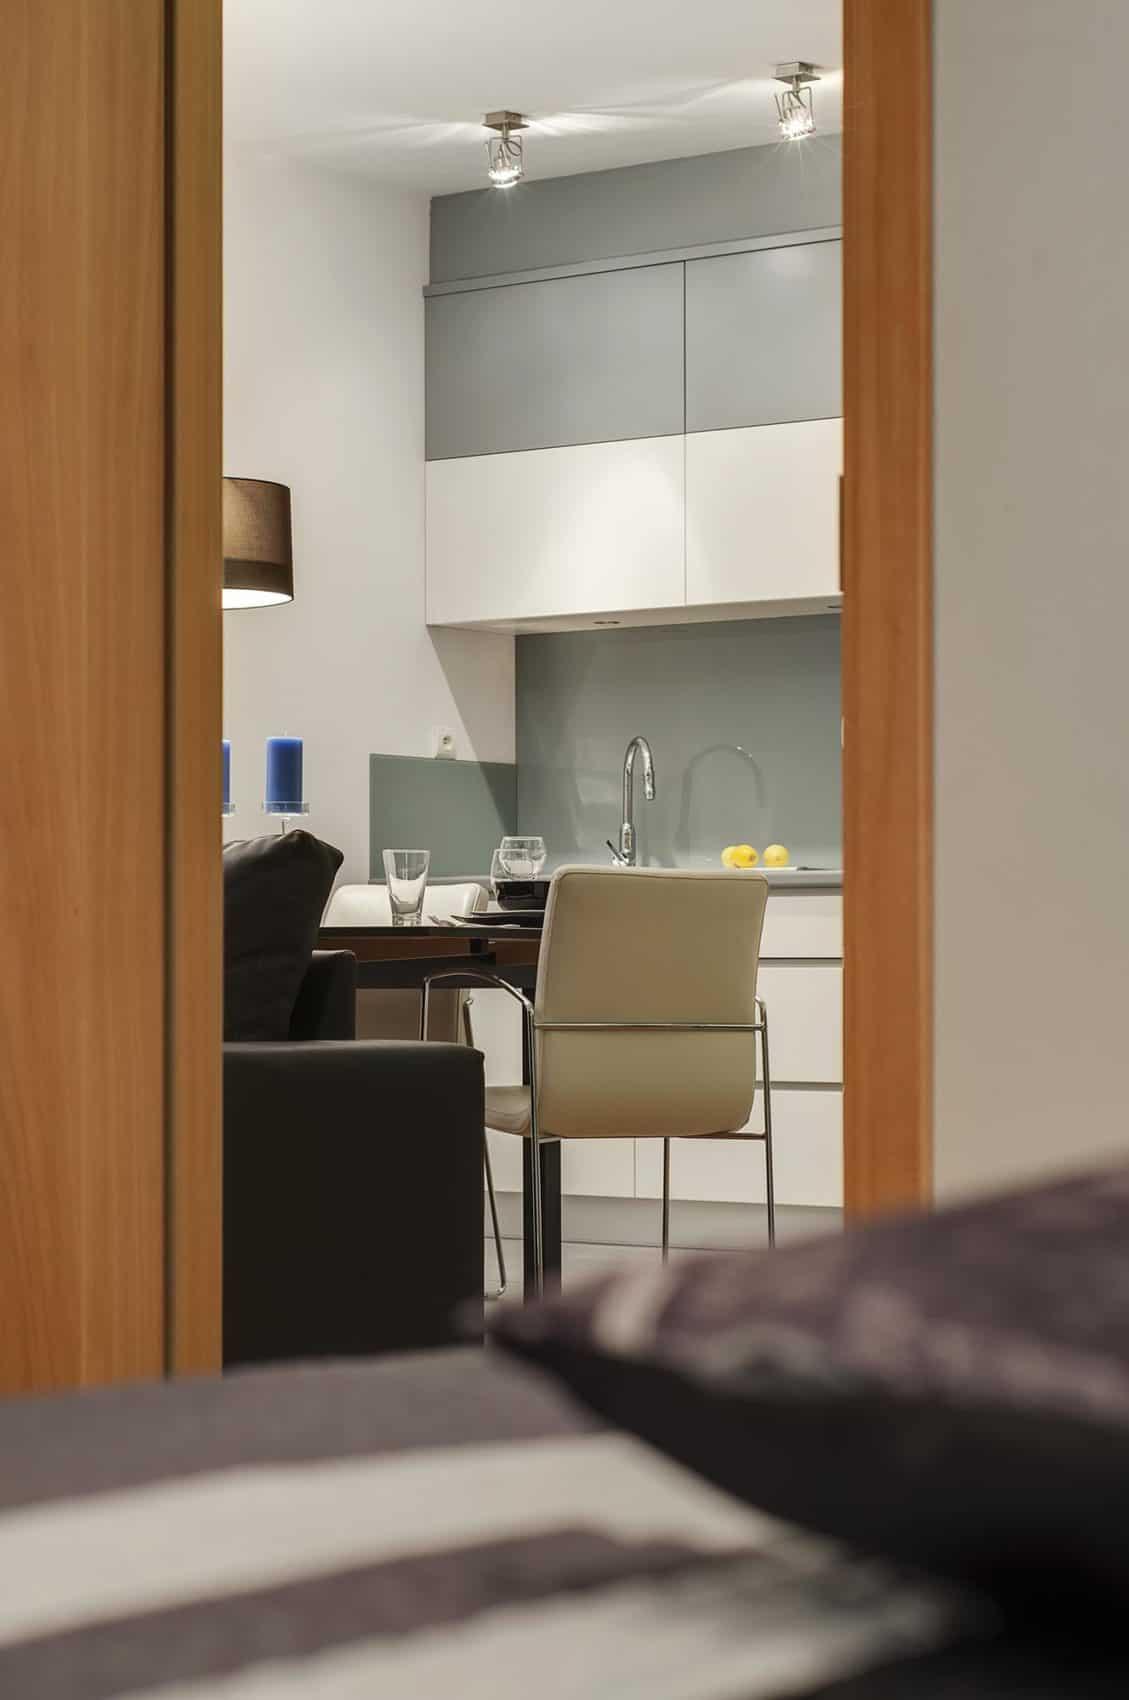 Wislane Tarasy Apartment in Krakow (6)